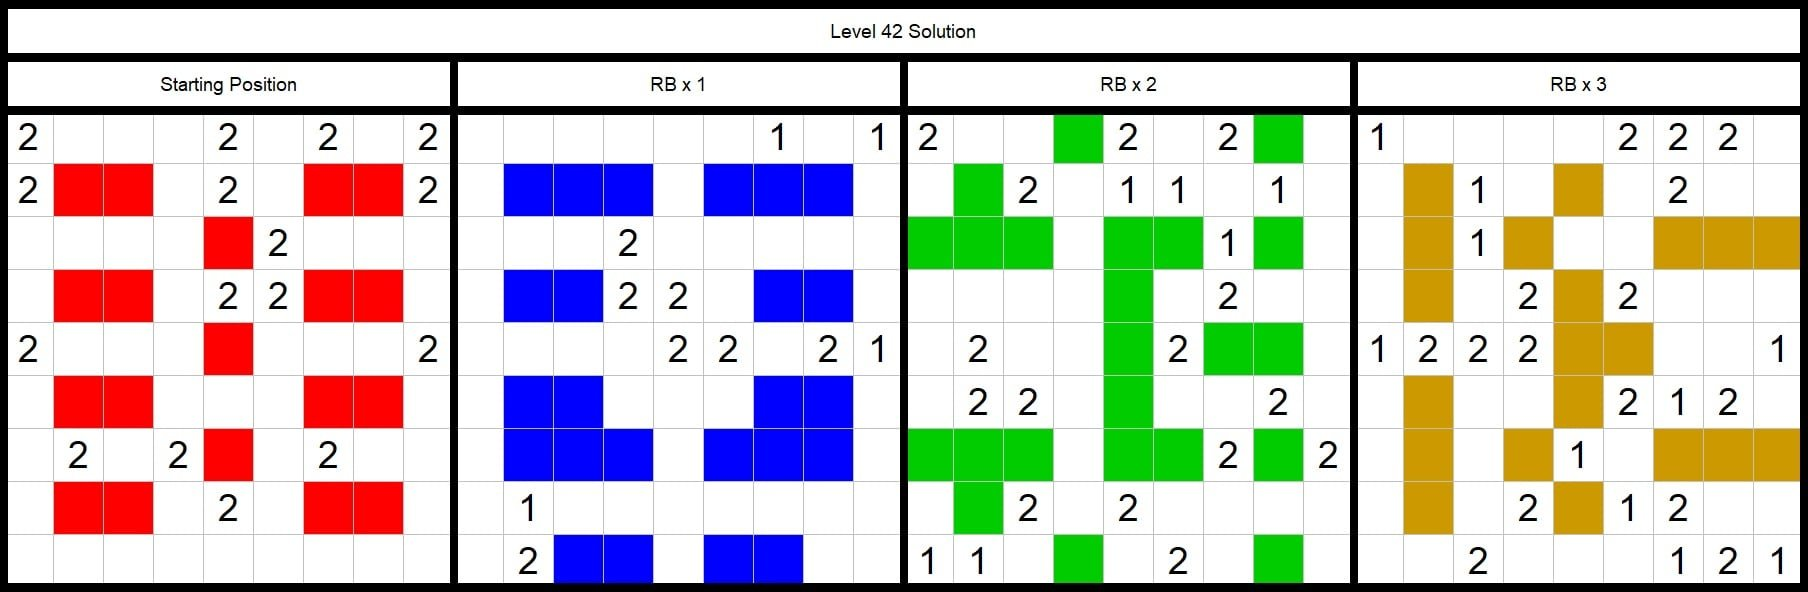 Level 42 Solution